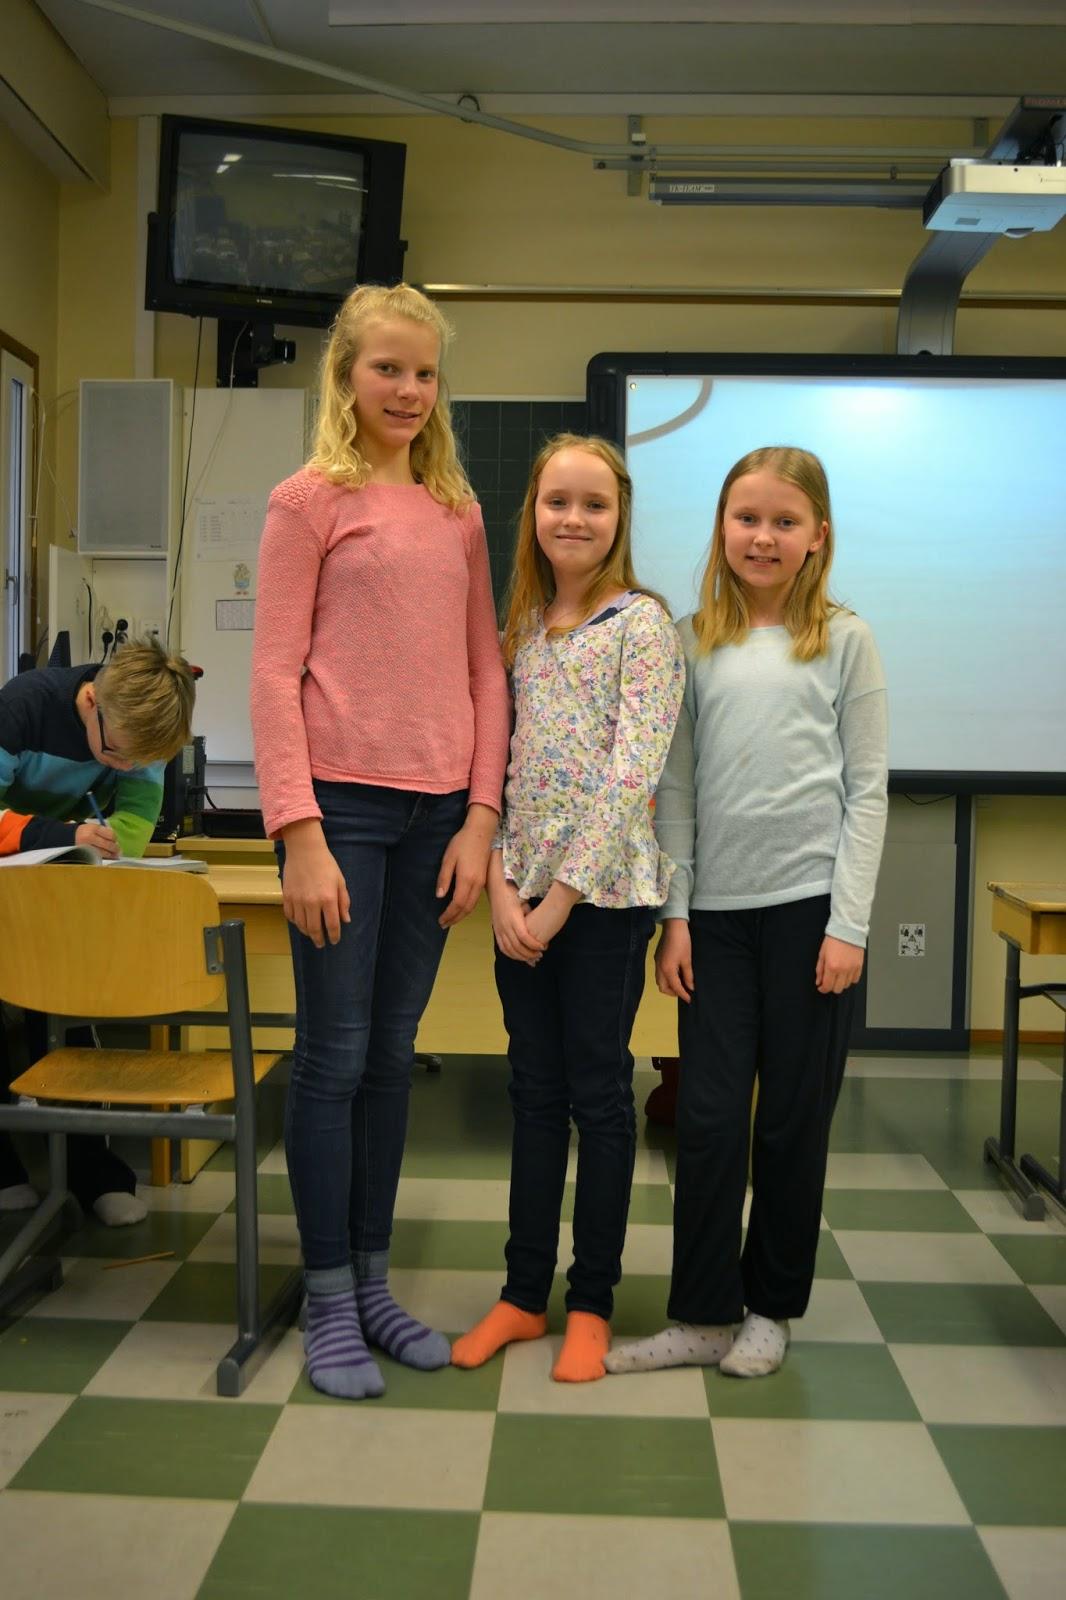 girls wearing sweatpants to school